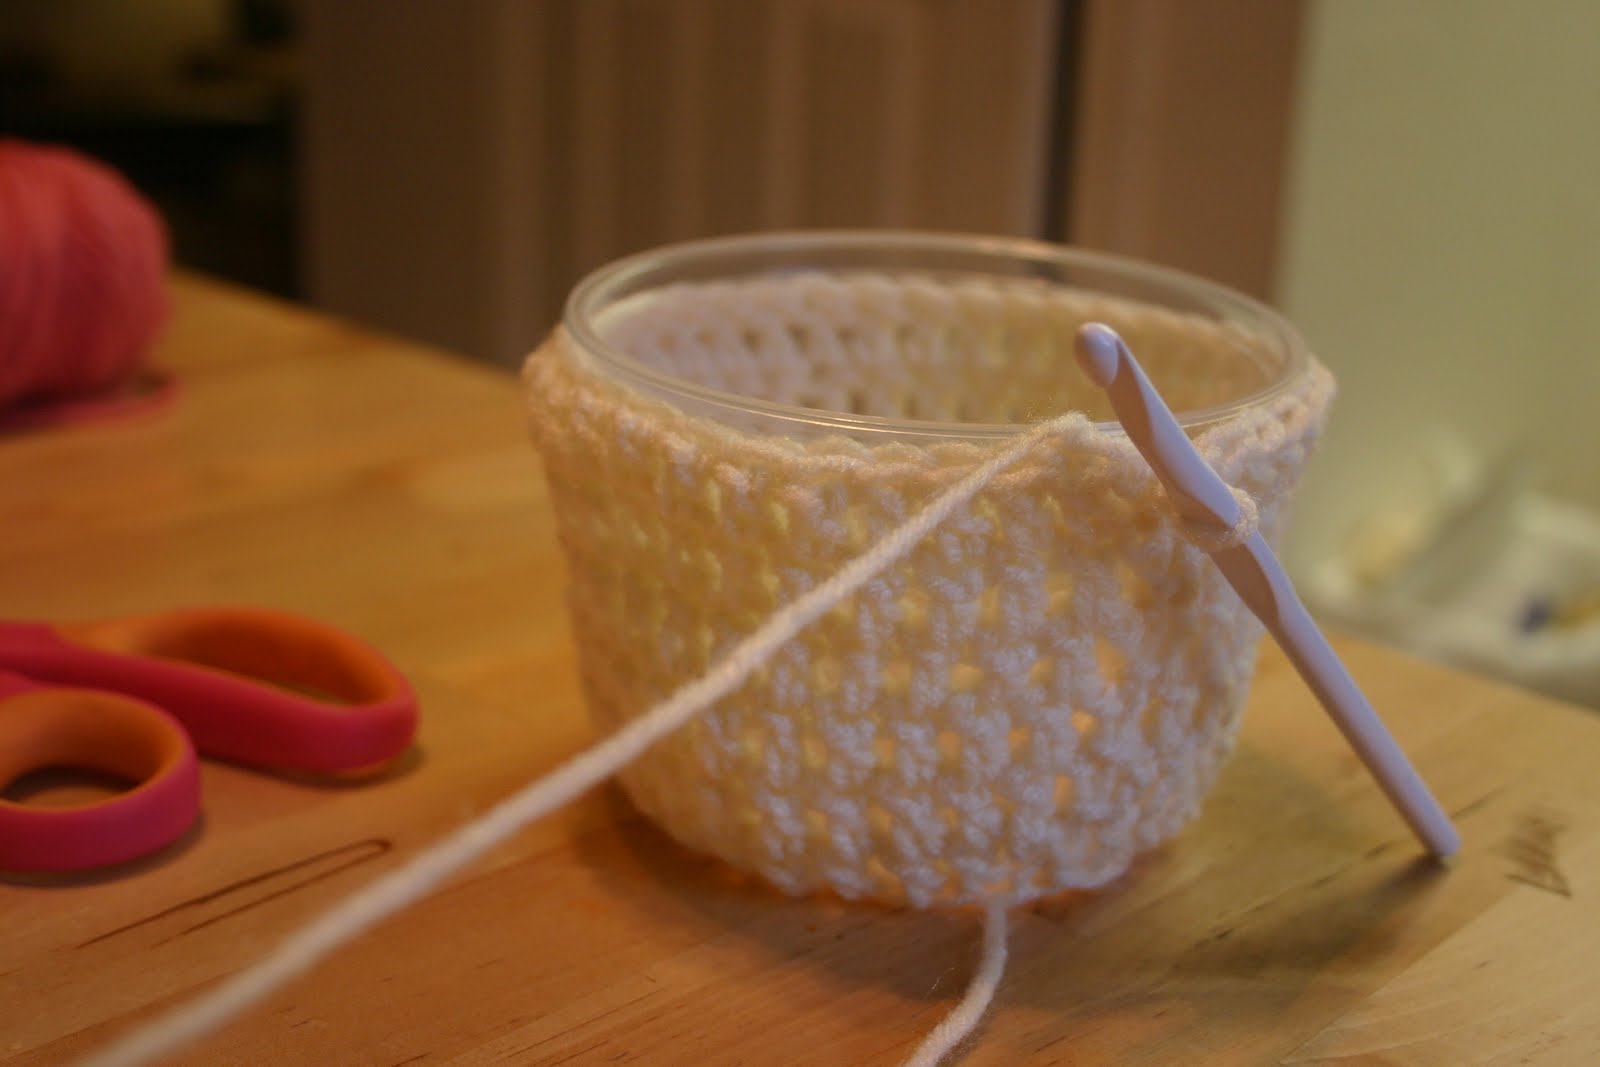 CROCHET CUPCAKE PATTERN – Crochet Patterns